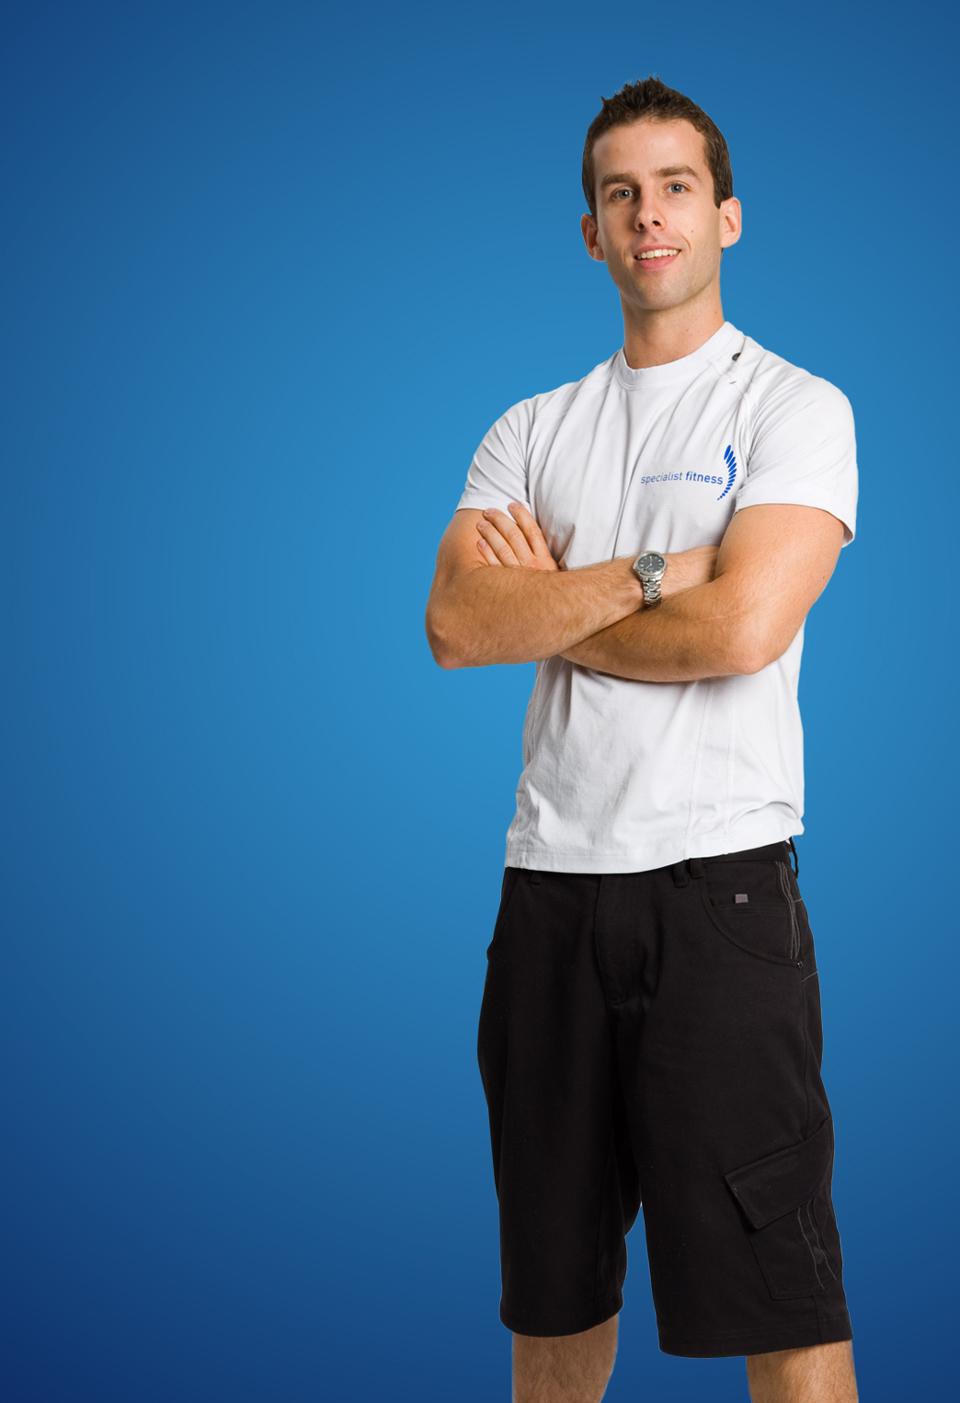 specialist fitness uniform